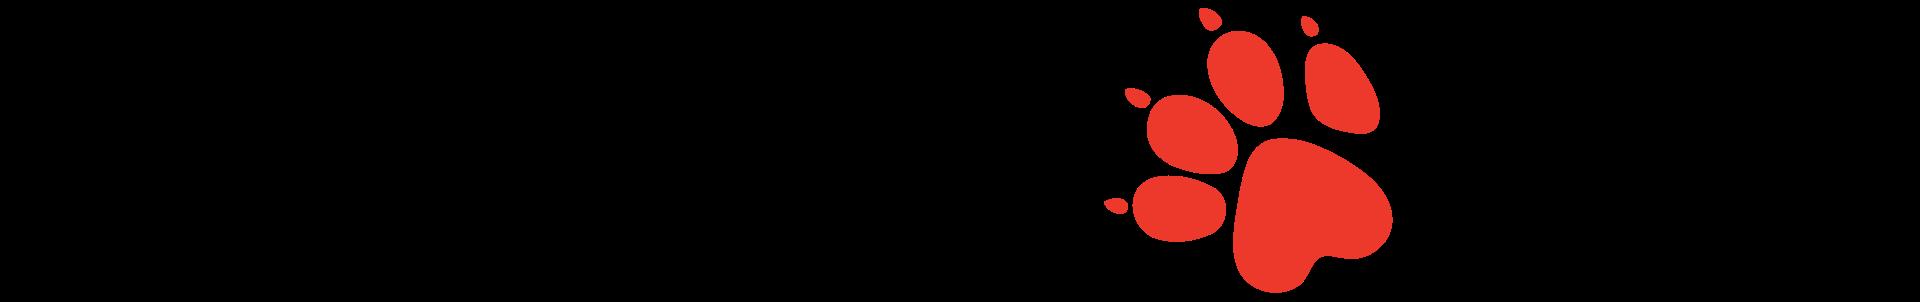 Naughty Dog logo.png